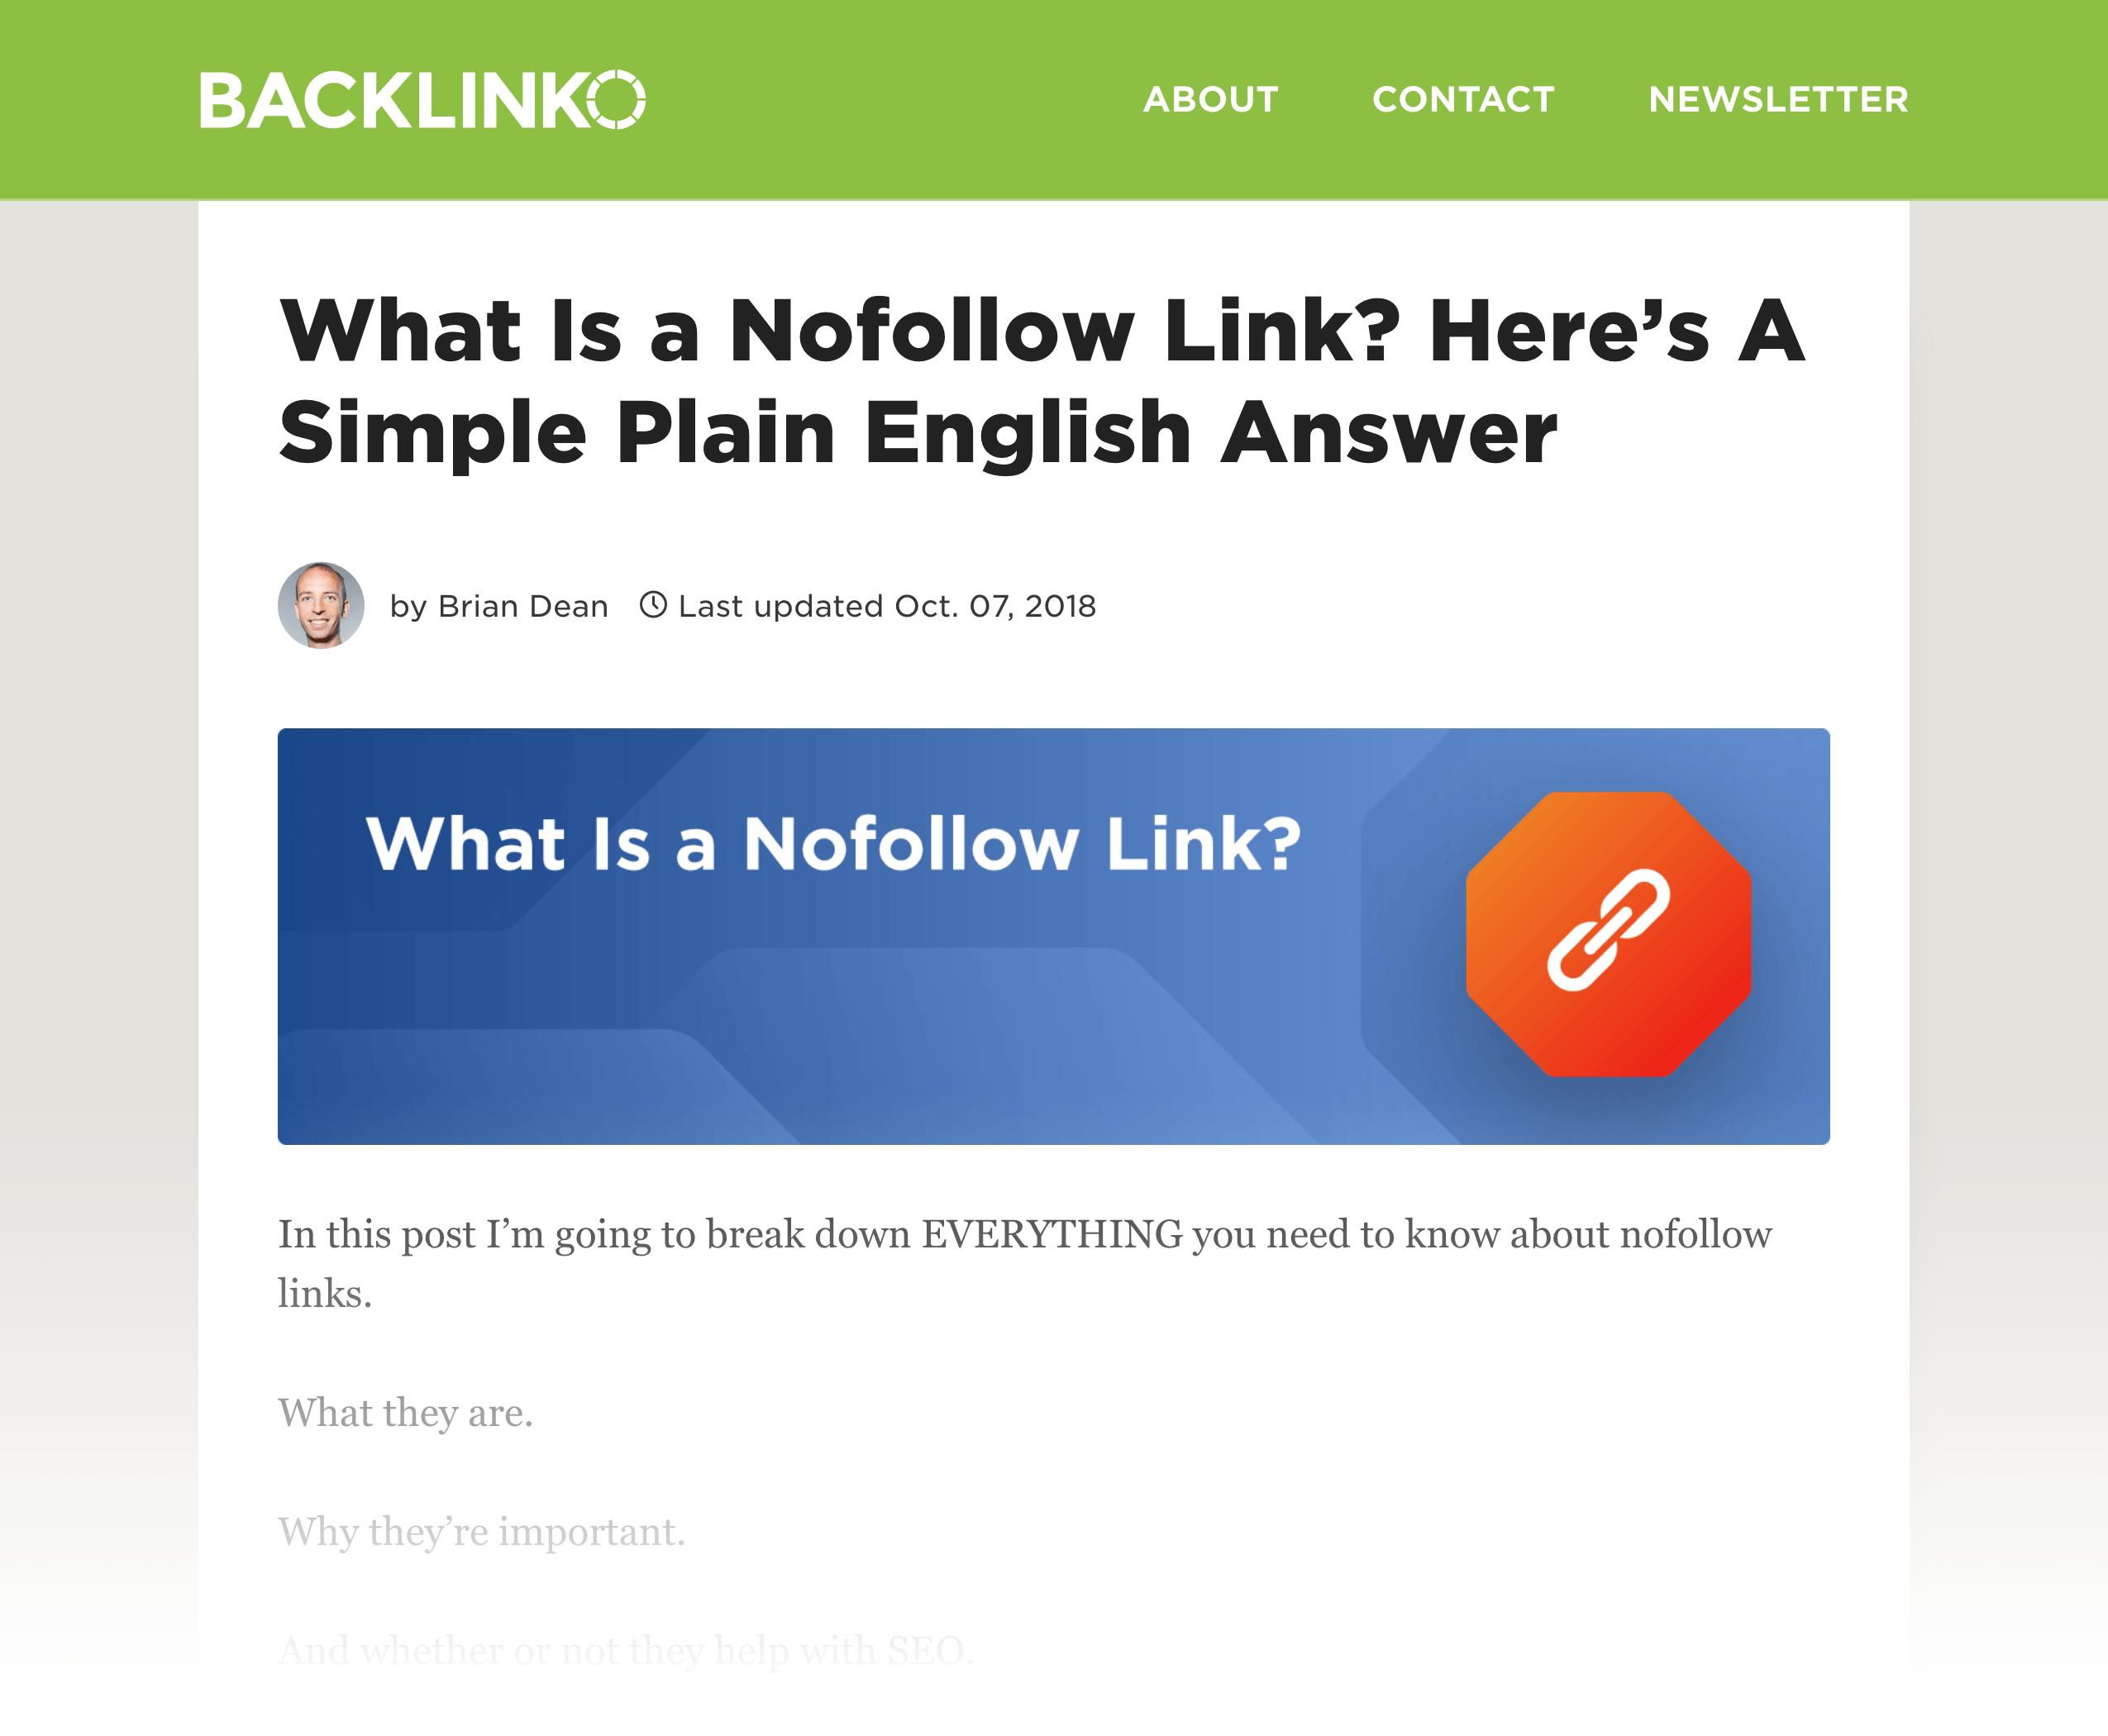 Nofollow Link post